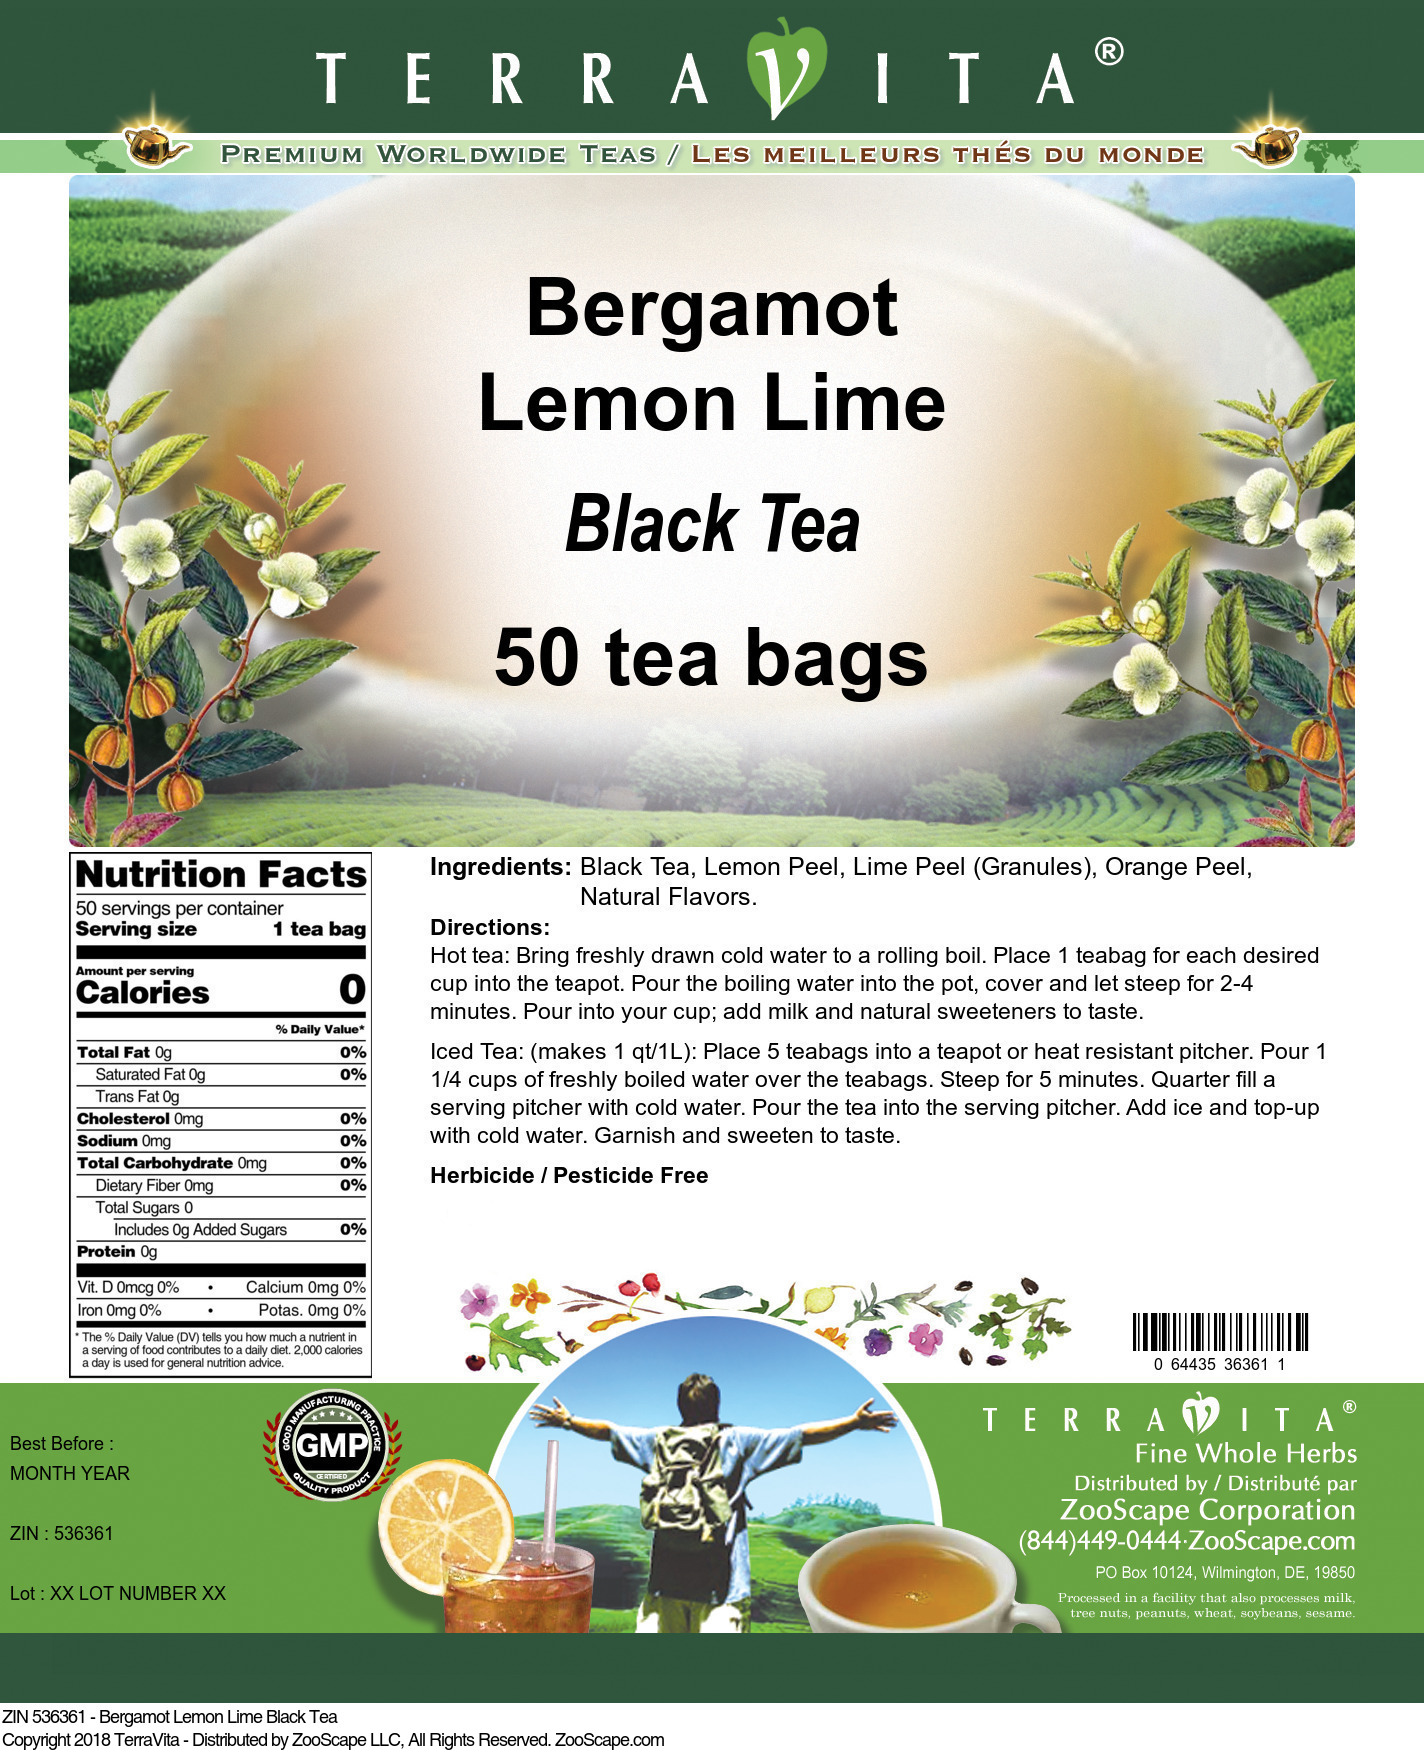 Bergamot Lemon Lime Black Tea